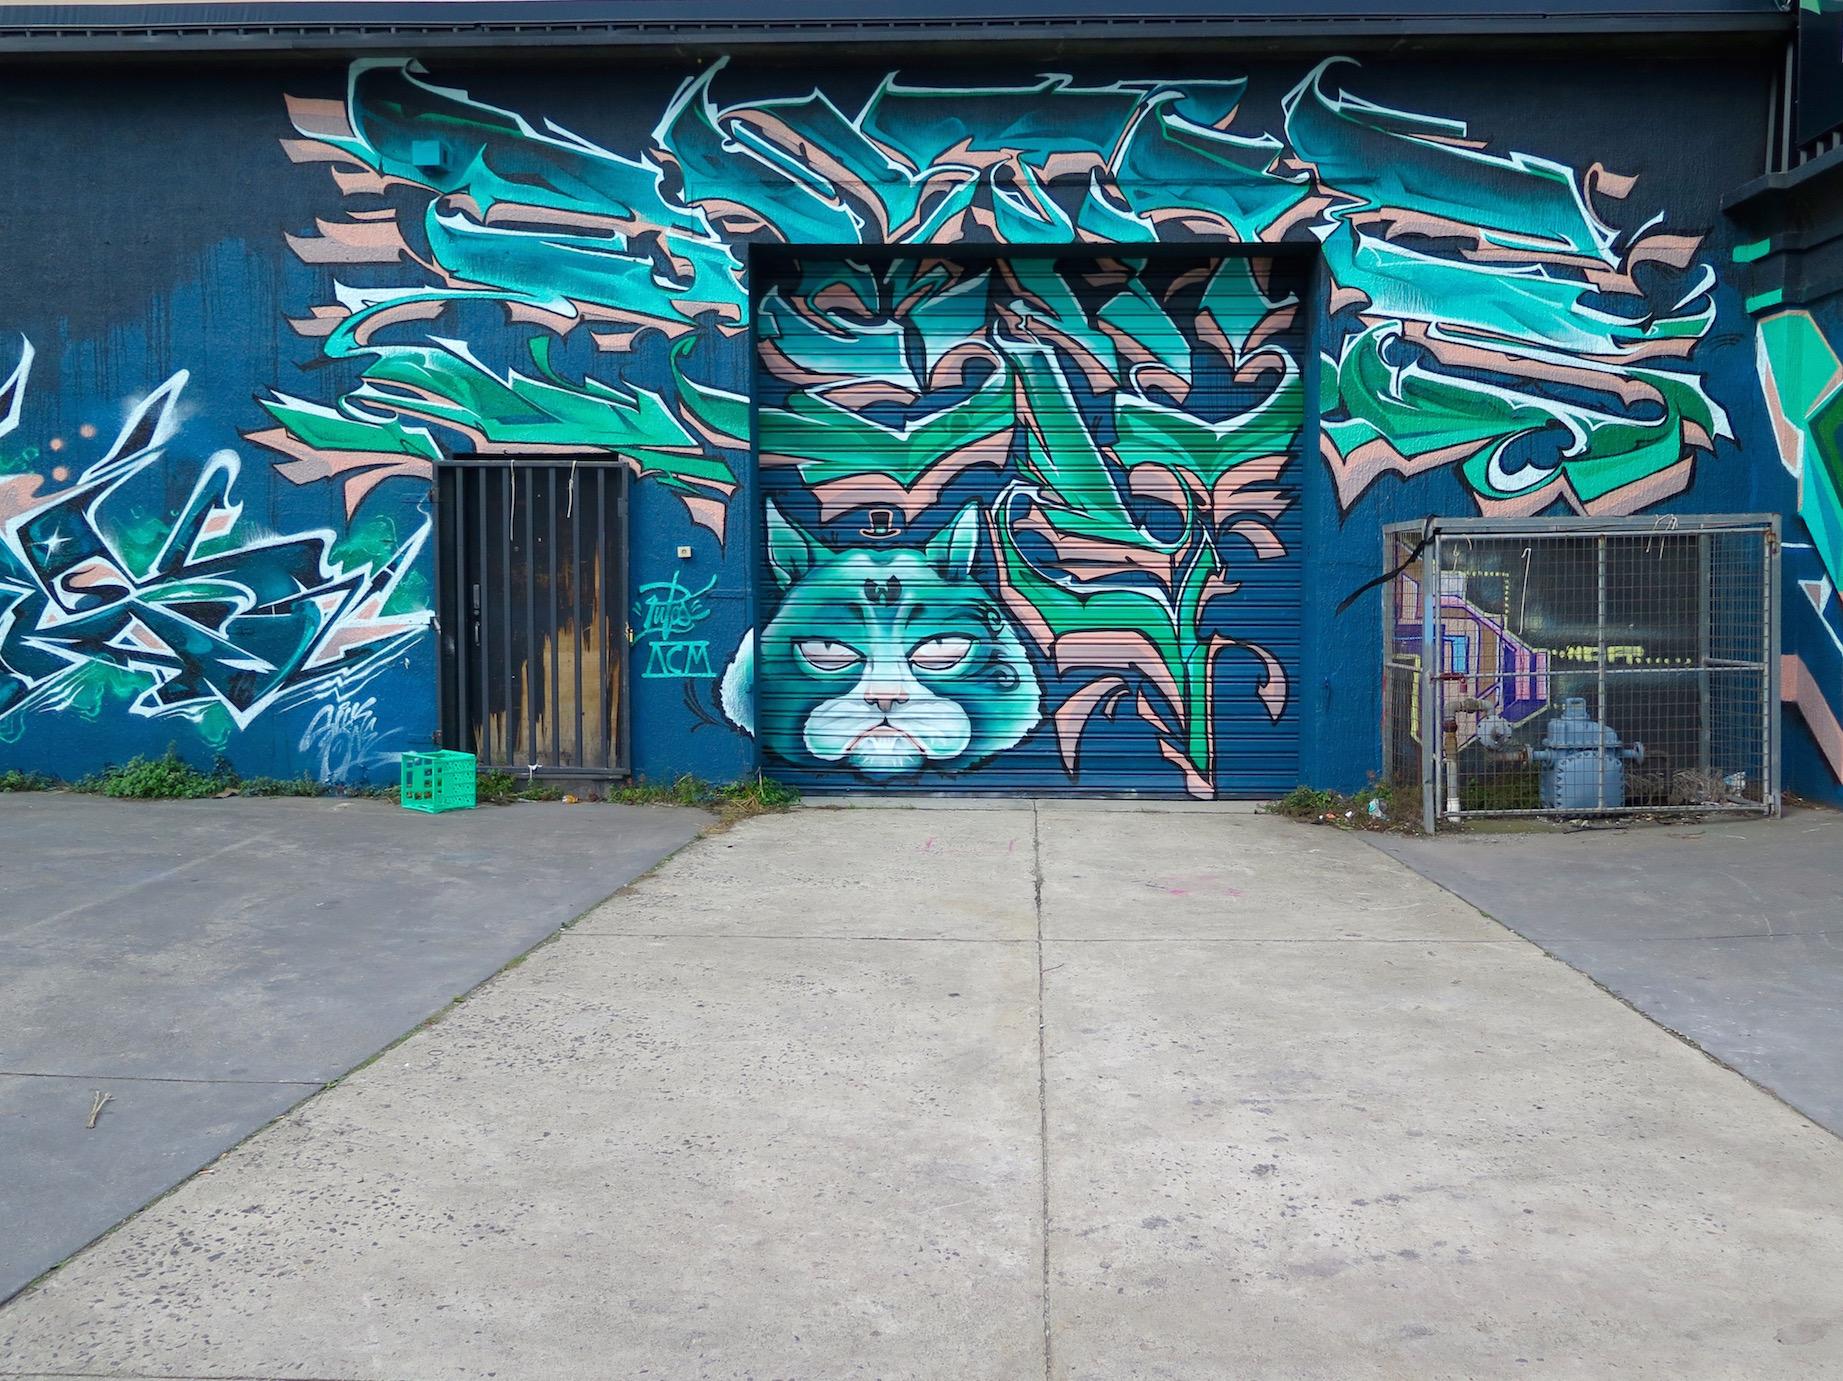 deansunshine_landofsunshine_melbourne_streetart_graffiti_lygon place graff takeover 2